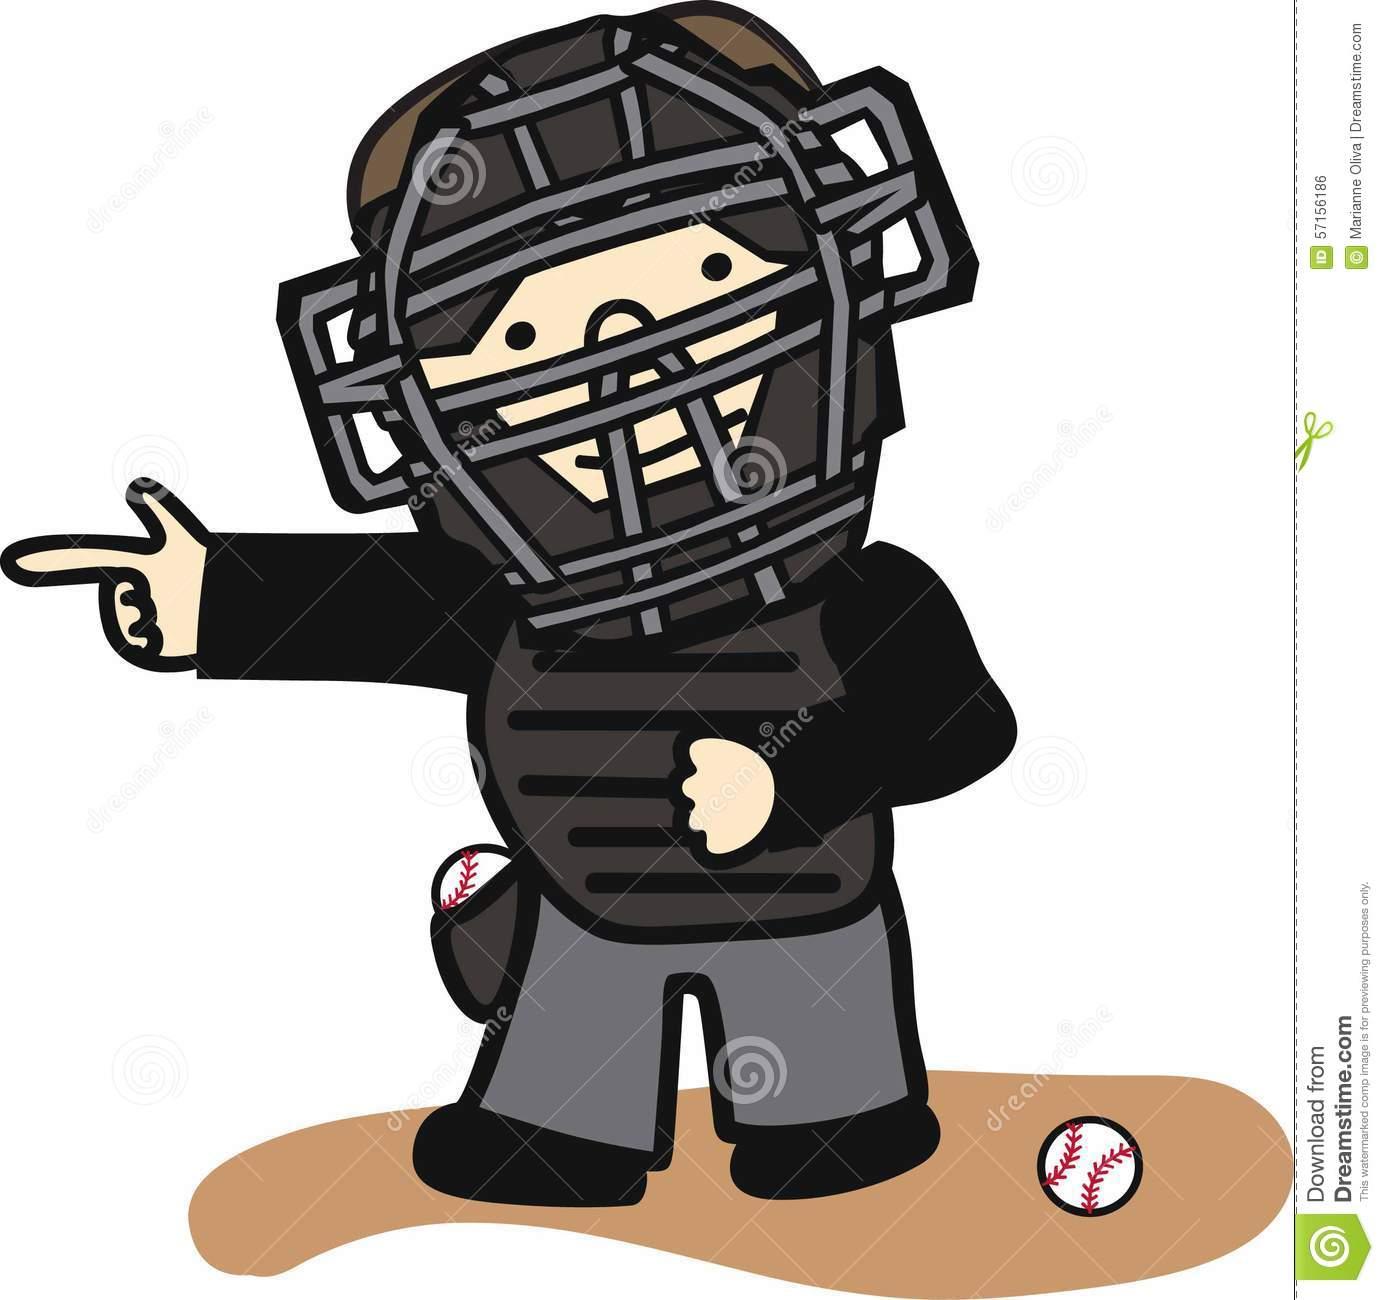 Baseball umpire clipar... pic source-Baseball umpire clipar... pic source-14